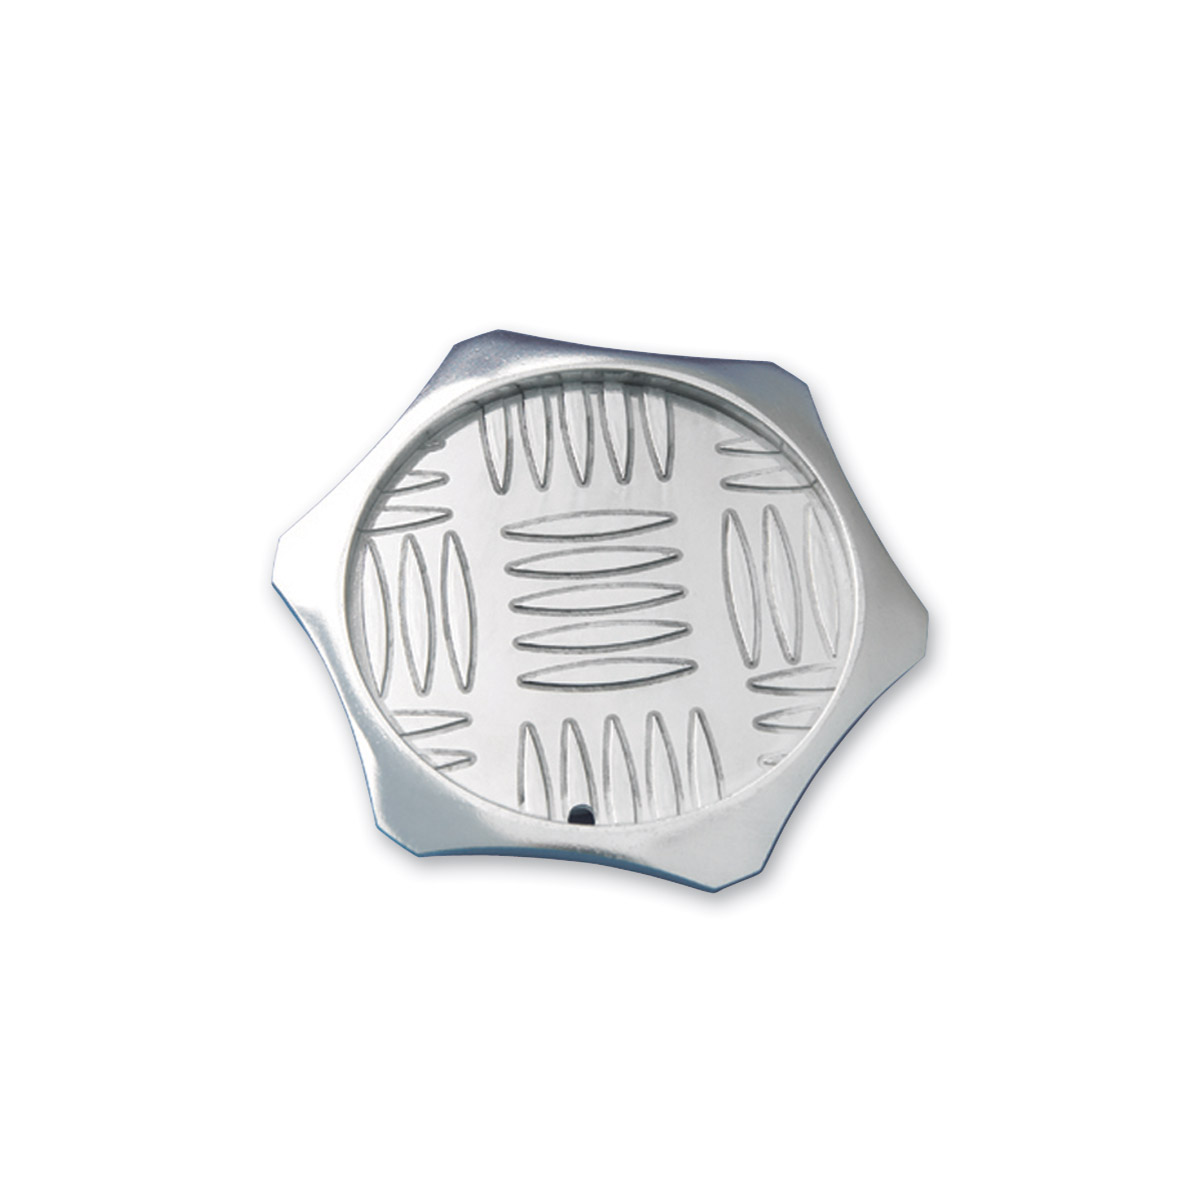 Show Chrome Accessories Aluminum Disc Kickstand Pad